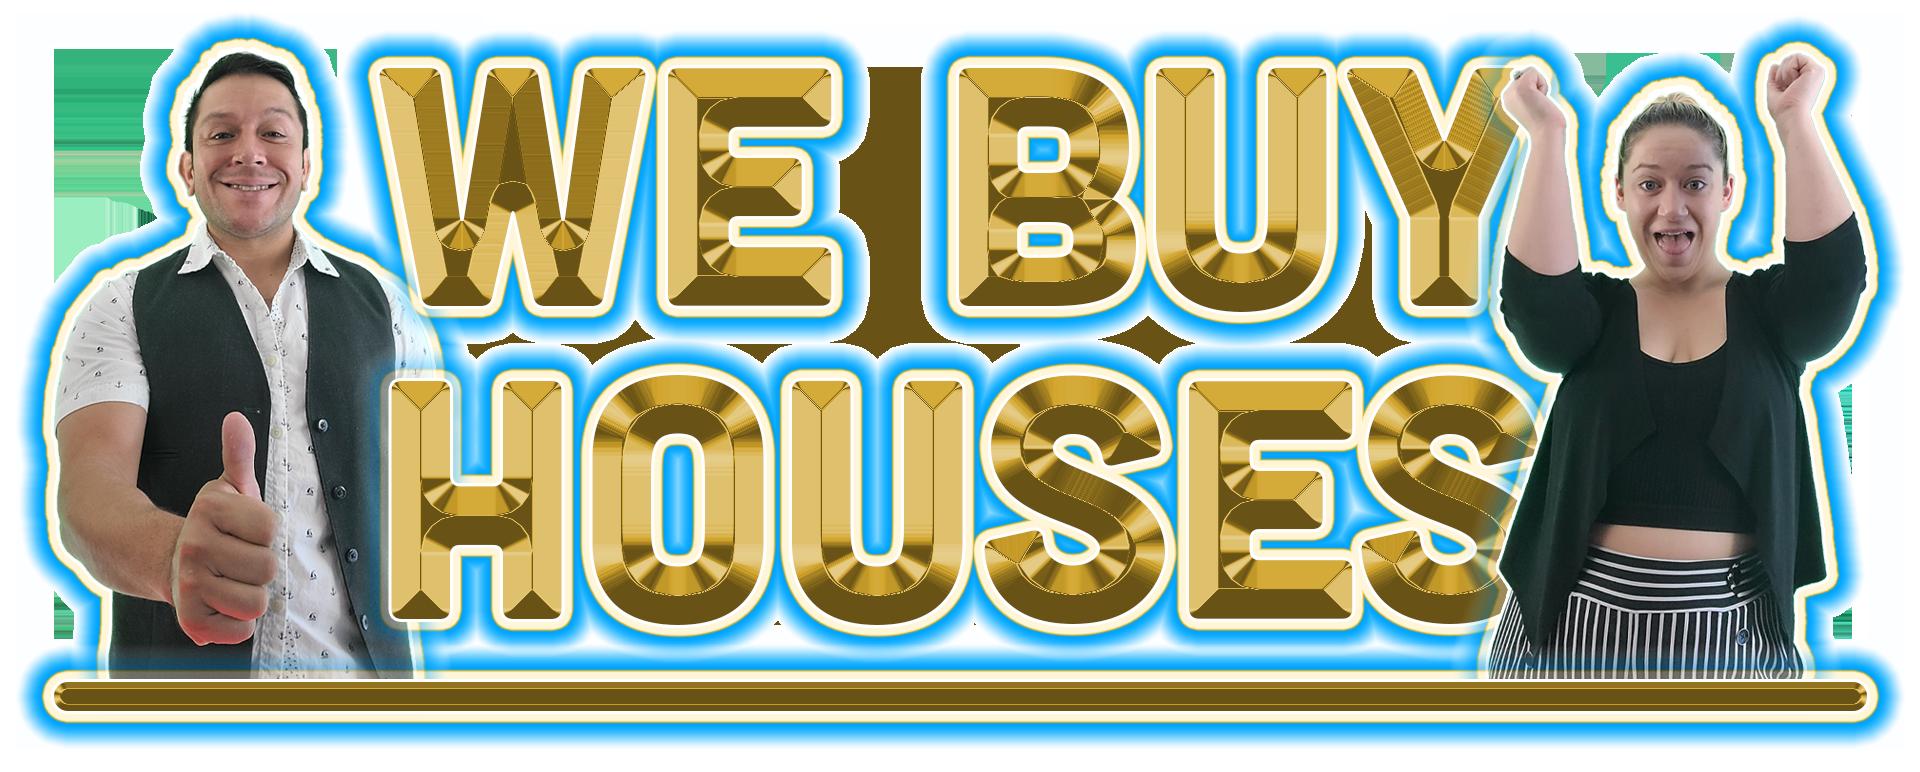 Cash House Buyers - We Buy Houses Cash - Nassau Bay Texas - Houston Texas - Luxdominor.com